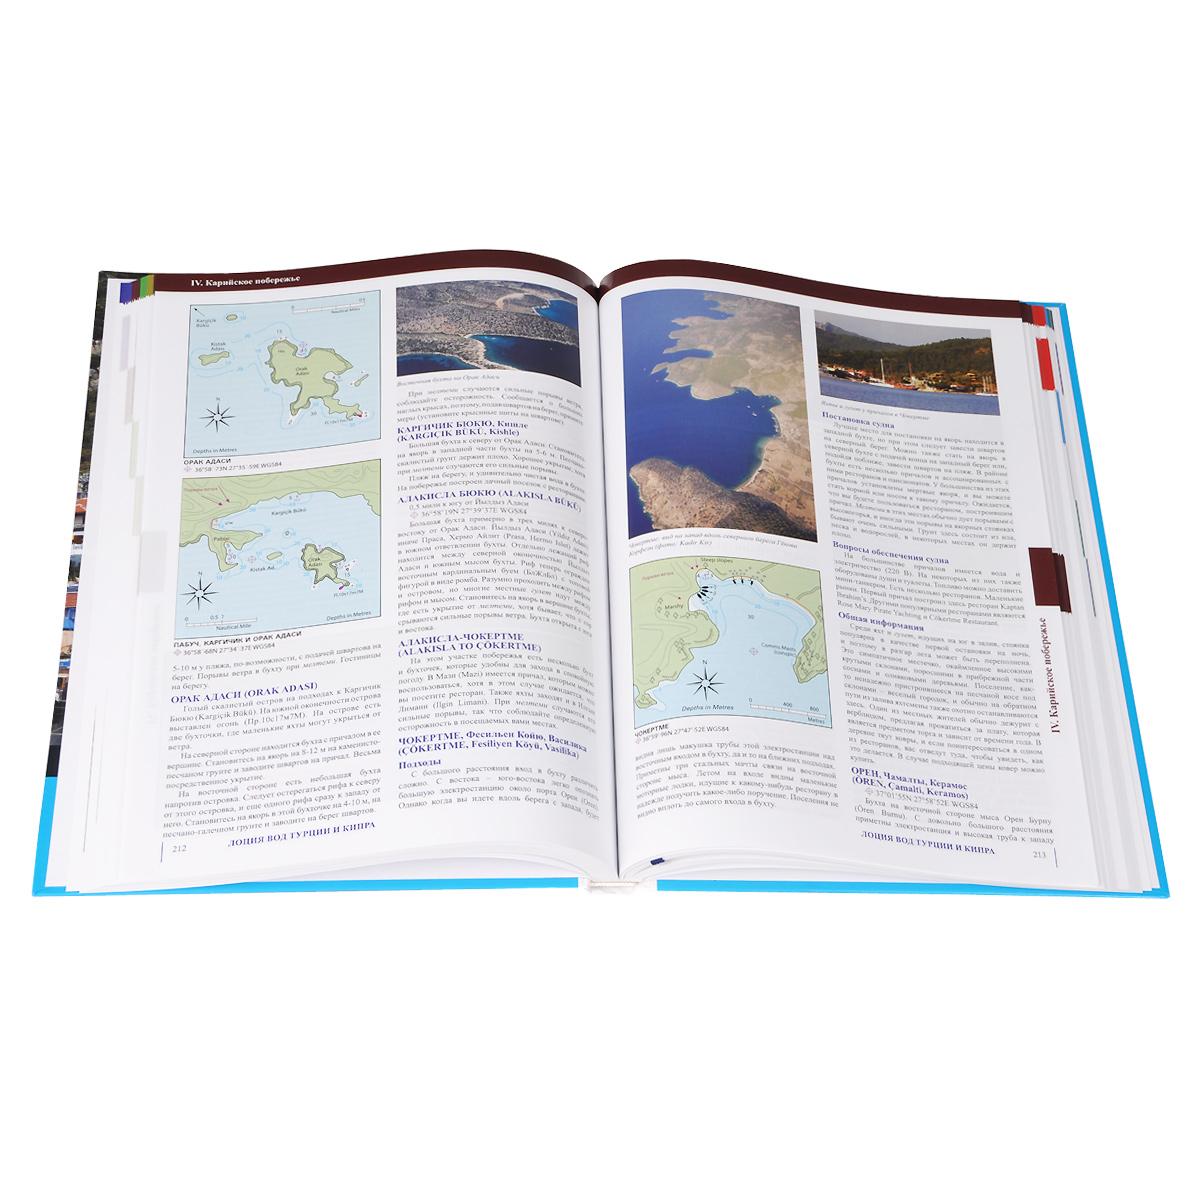 Лоция вод Турции и Кипра, Род и Люсинда Хейкелл